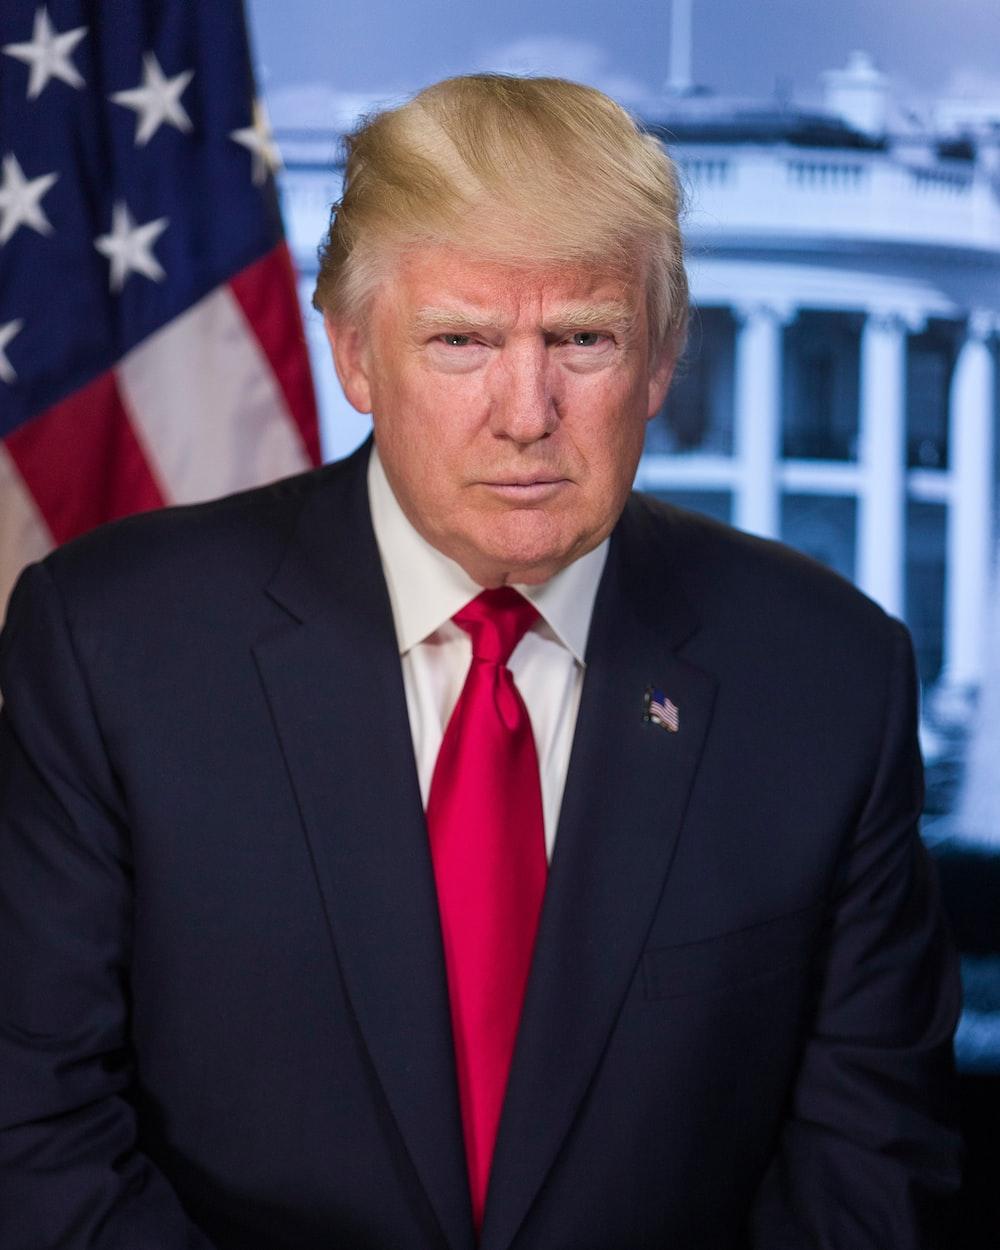 President Donald Trump photo – Free Image on Unsplash